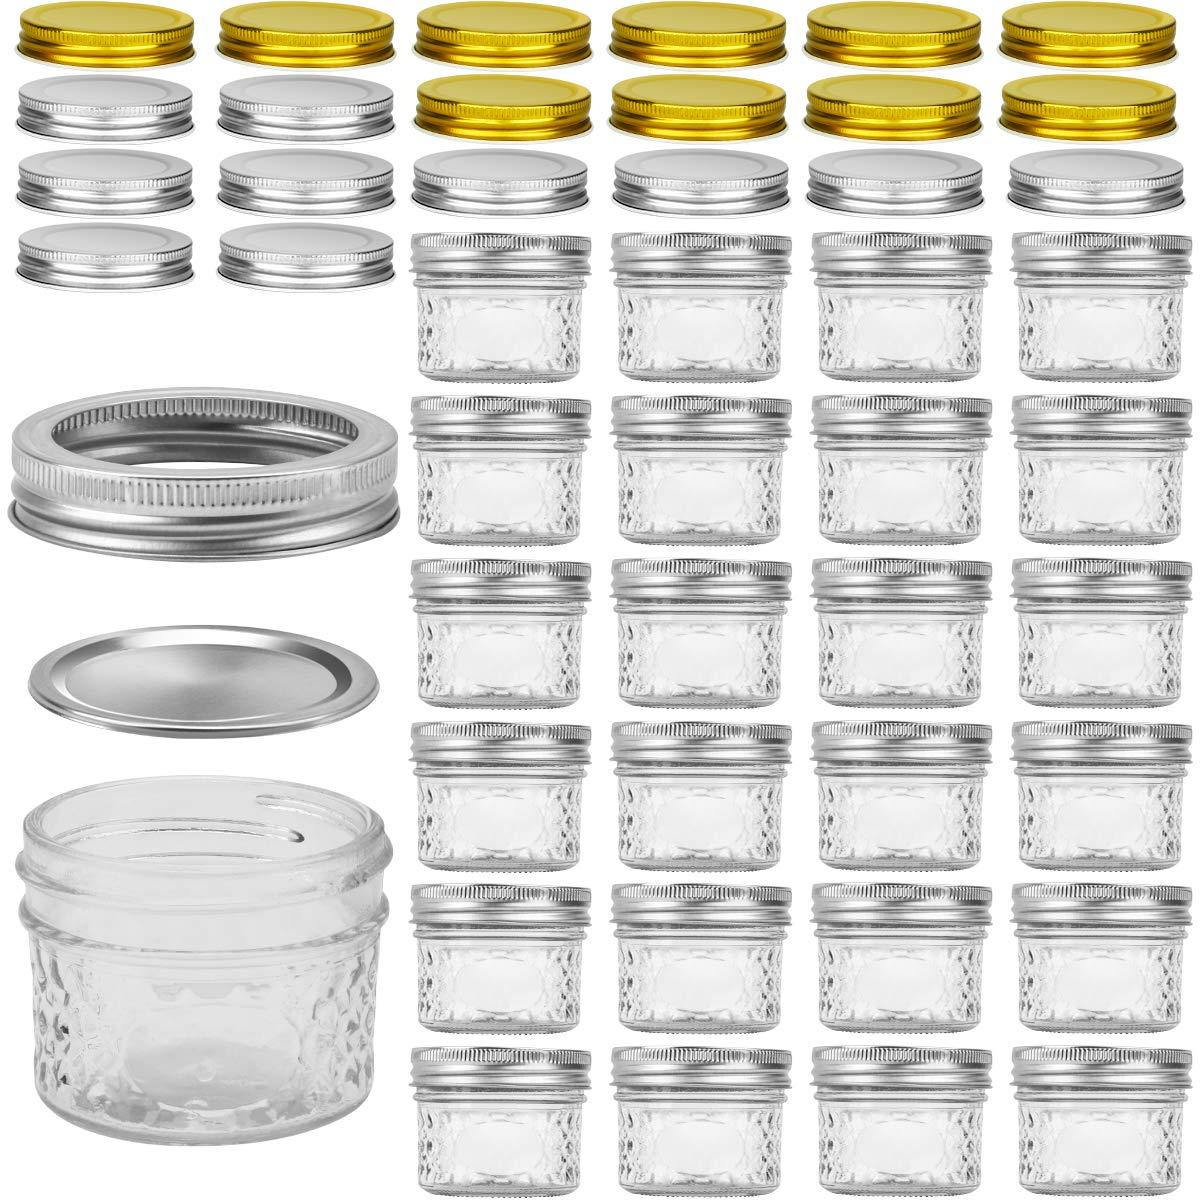 Mini Mason Jars, VERONES Mason Jars 4 oz With Regular Lids and Bands, Ideal for Jam, Honey, Wedding Favors, Shower Favors, Baby Foods, DIY Magnetic Spice Jars, 25 PACK, Extra 20 Lids.